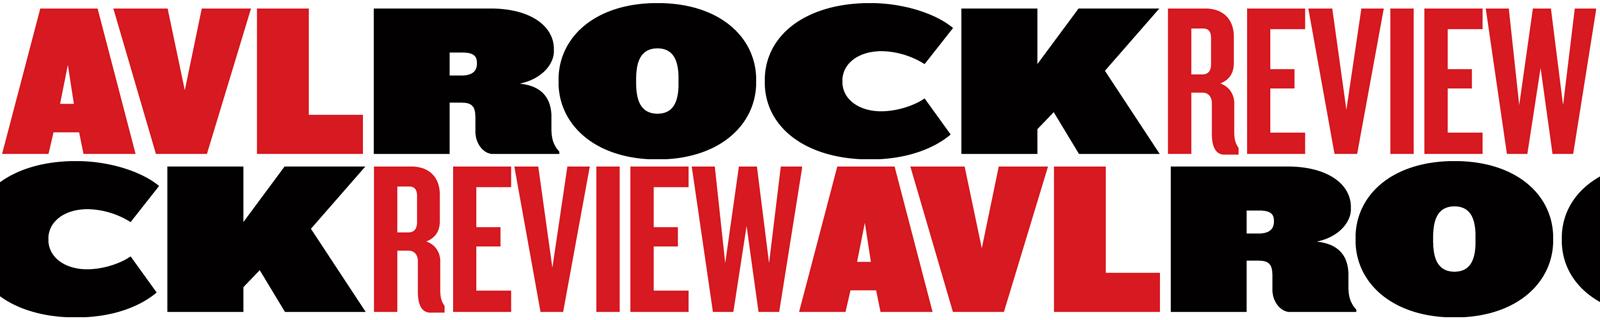 AVL ROCK REVIEW